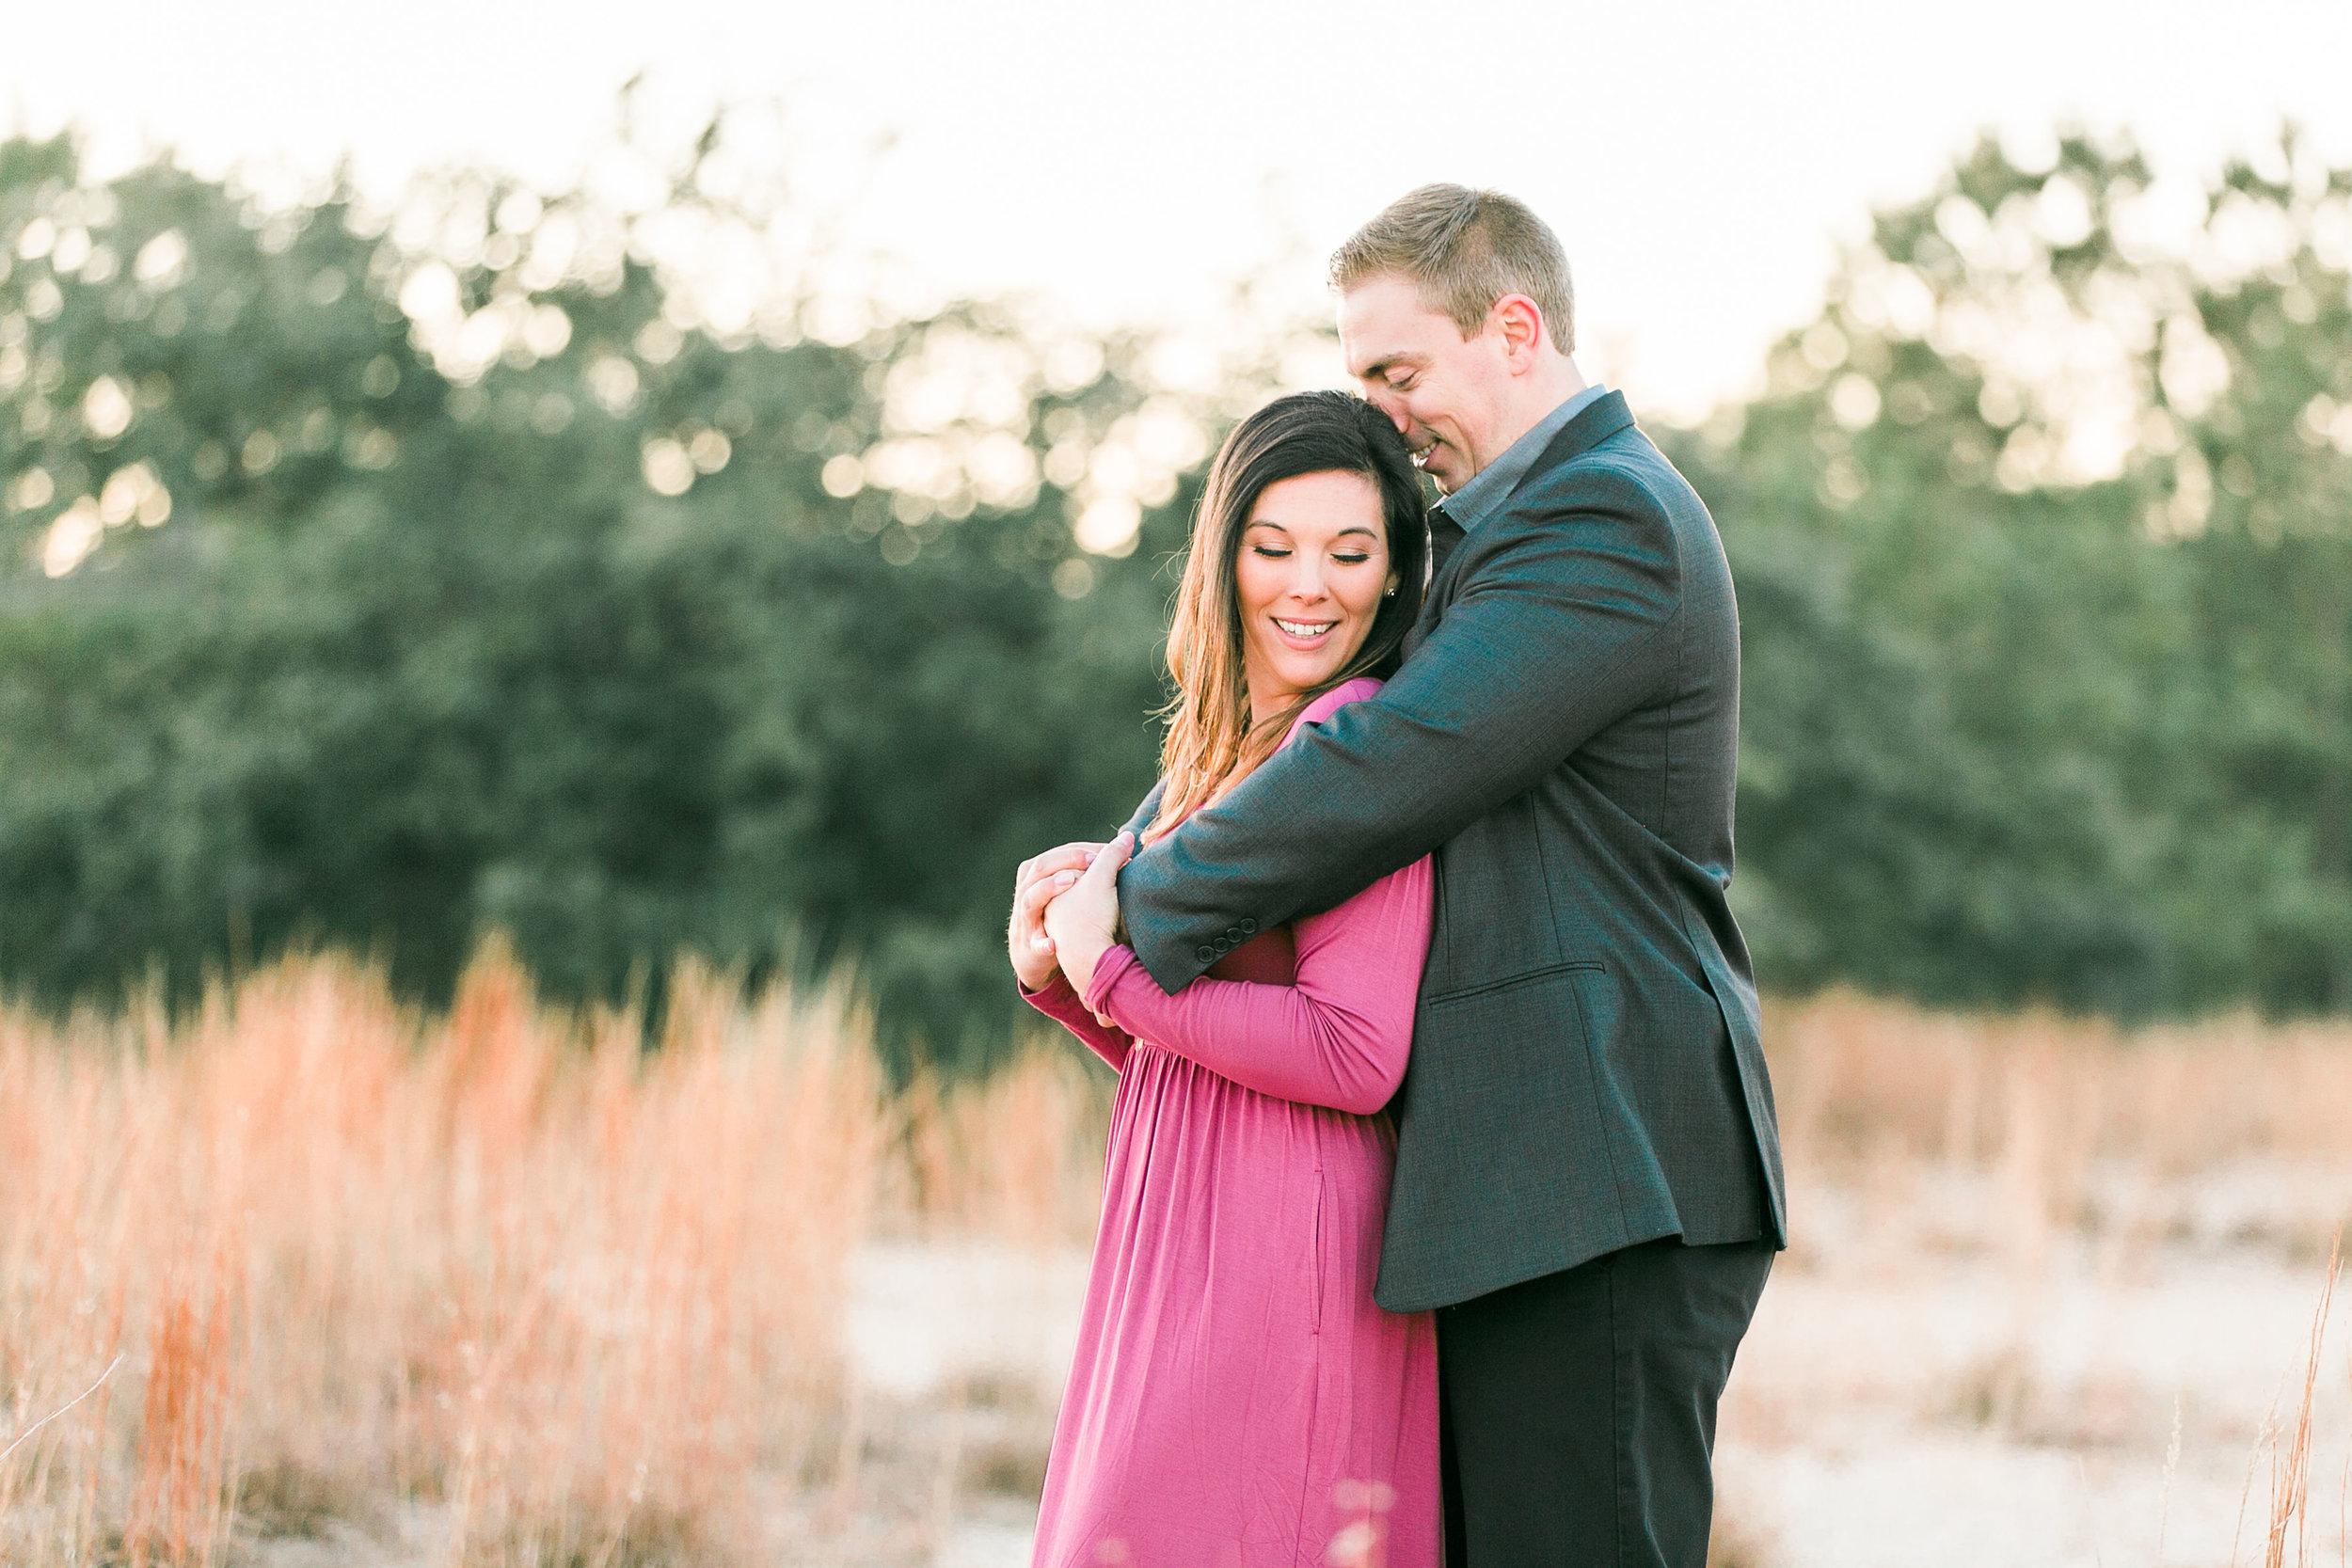 Nicole&Dustin_Engaged-317.jpg